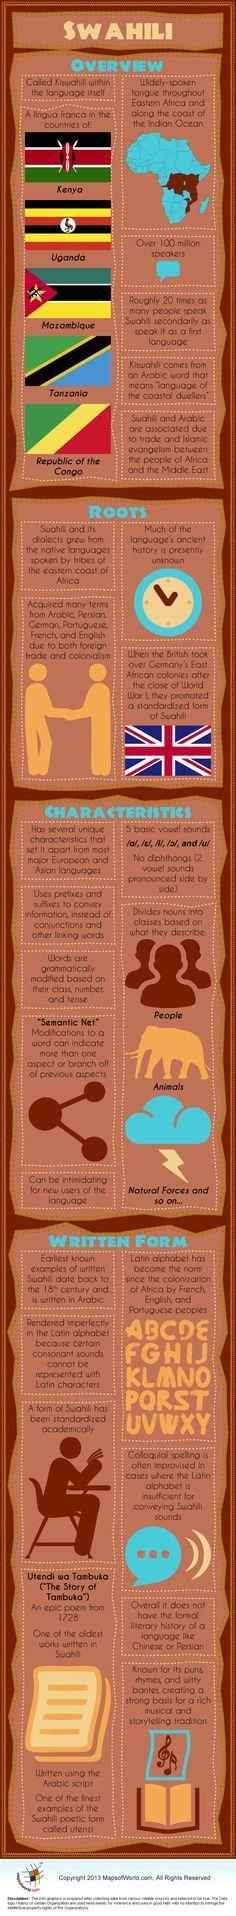 Infographic of Swahili Language